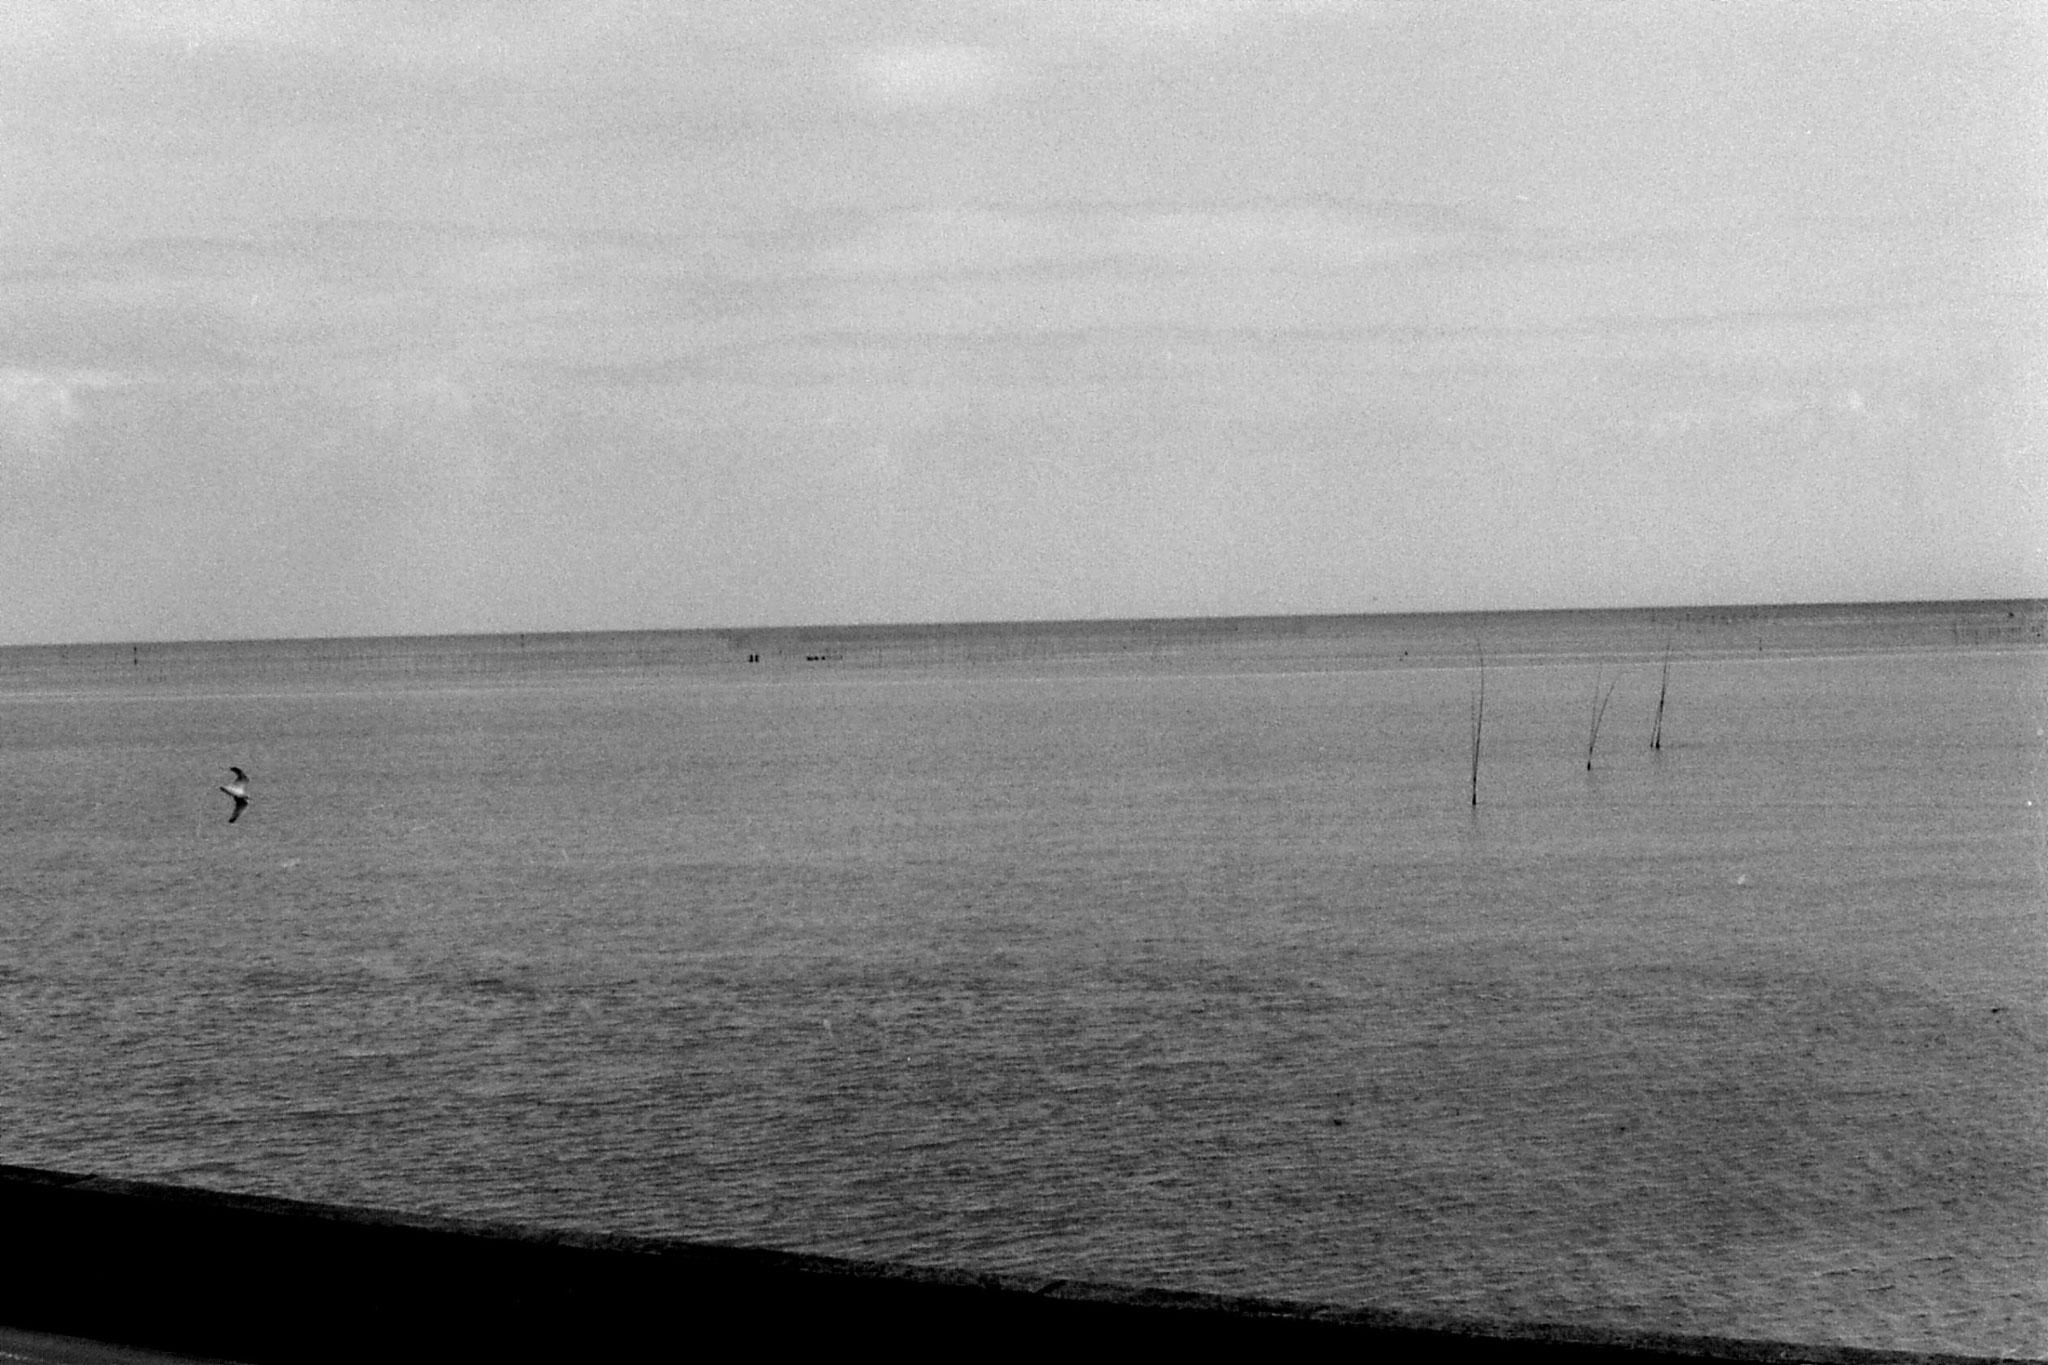 21/1/1989: 5: en route Nagasaki to Kumamoto